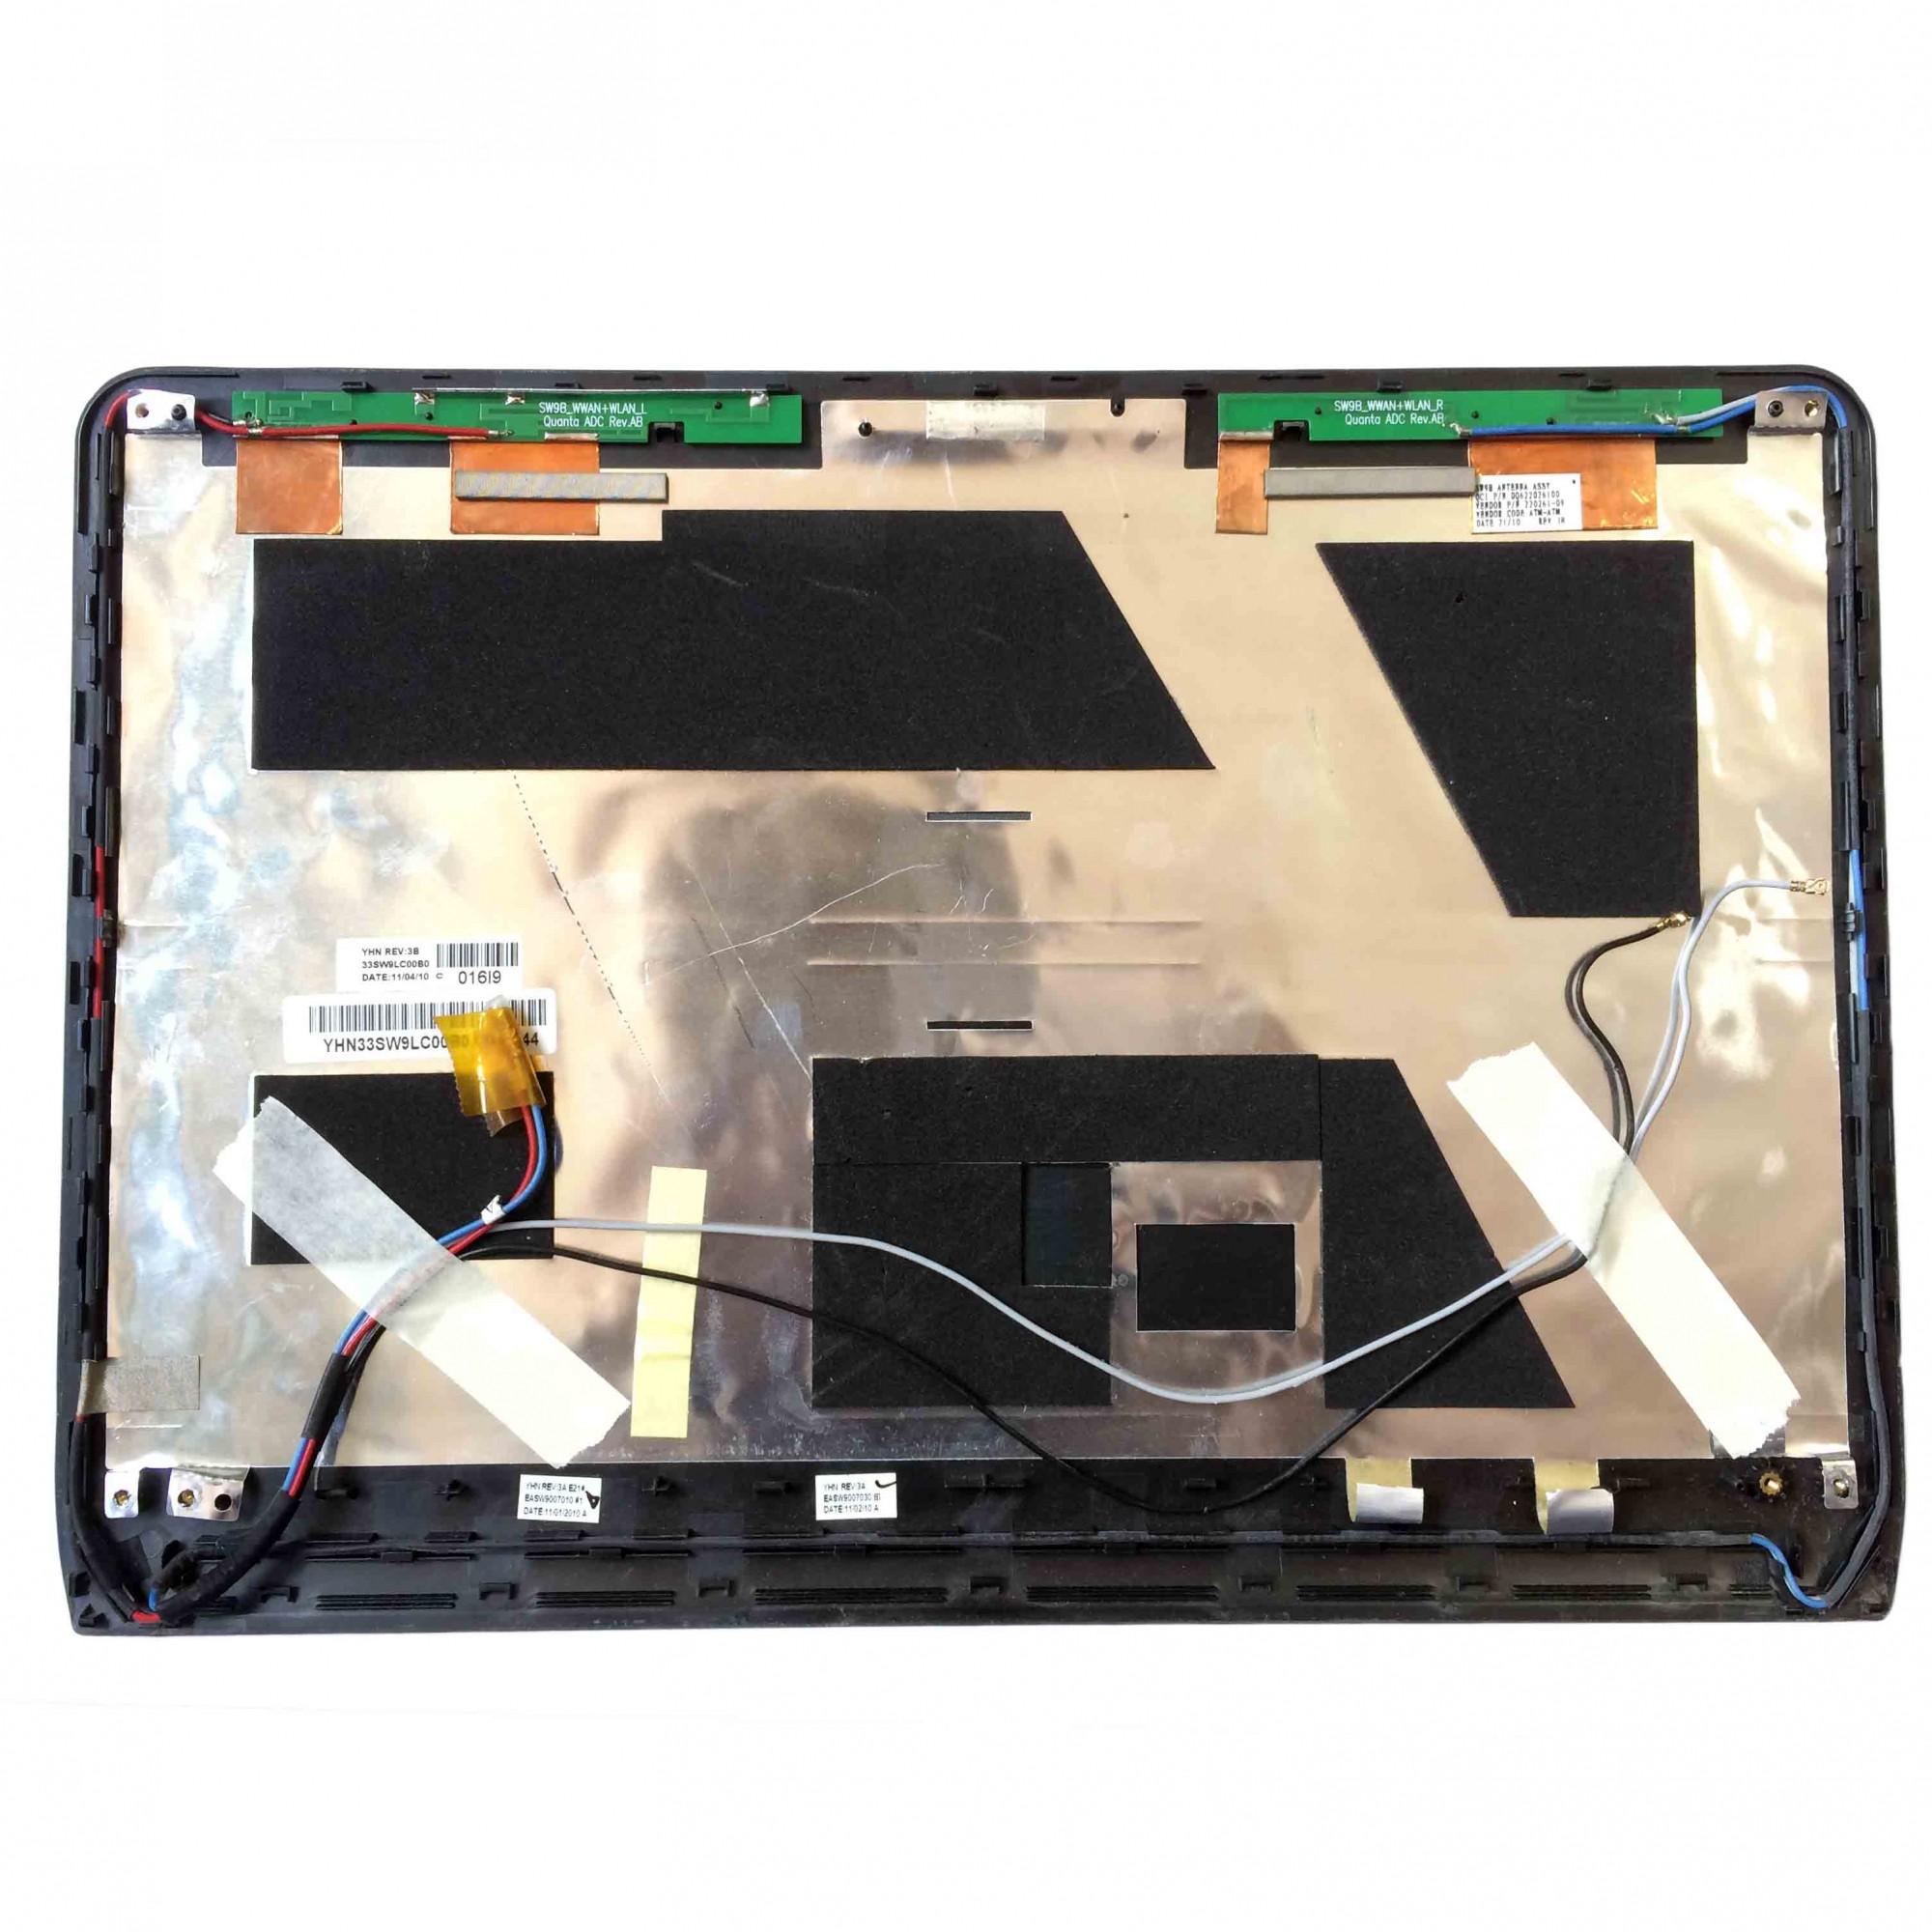 Carcaça Tampa LCD + Antenas Wi-Fi + Flats Notebook Itautec Inforway W7430 W7435 PN:EASW9007030 - Retirado